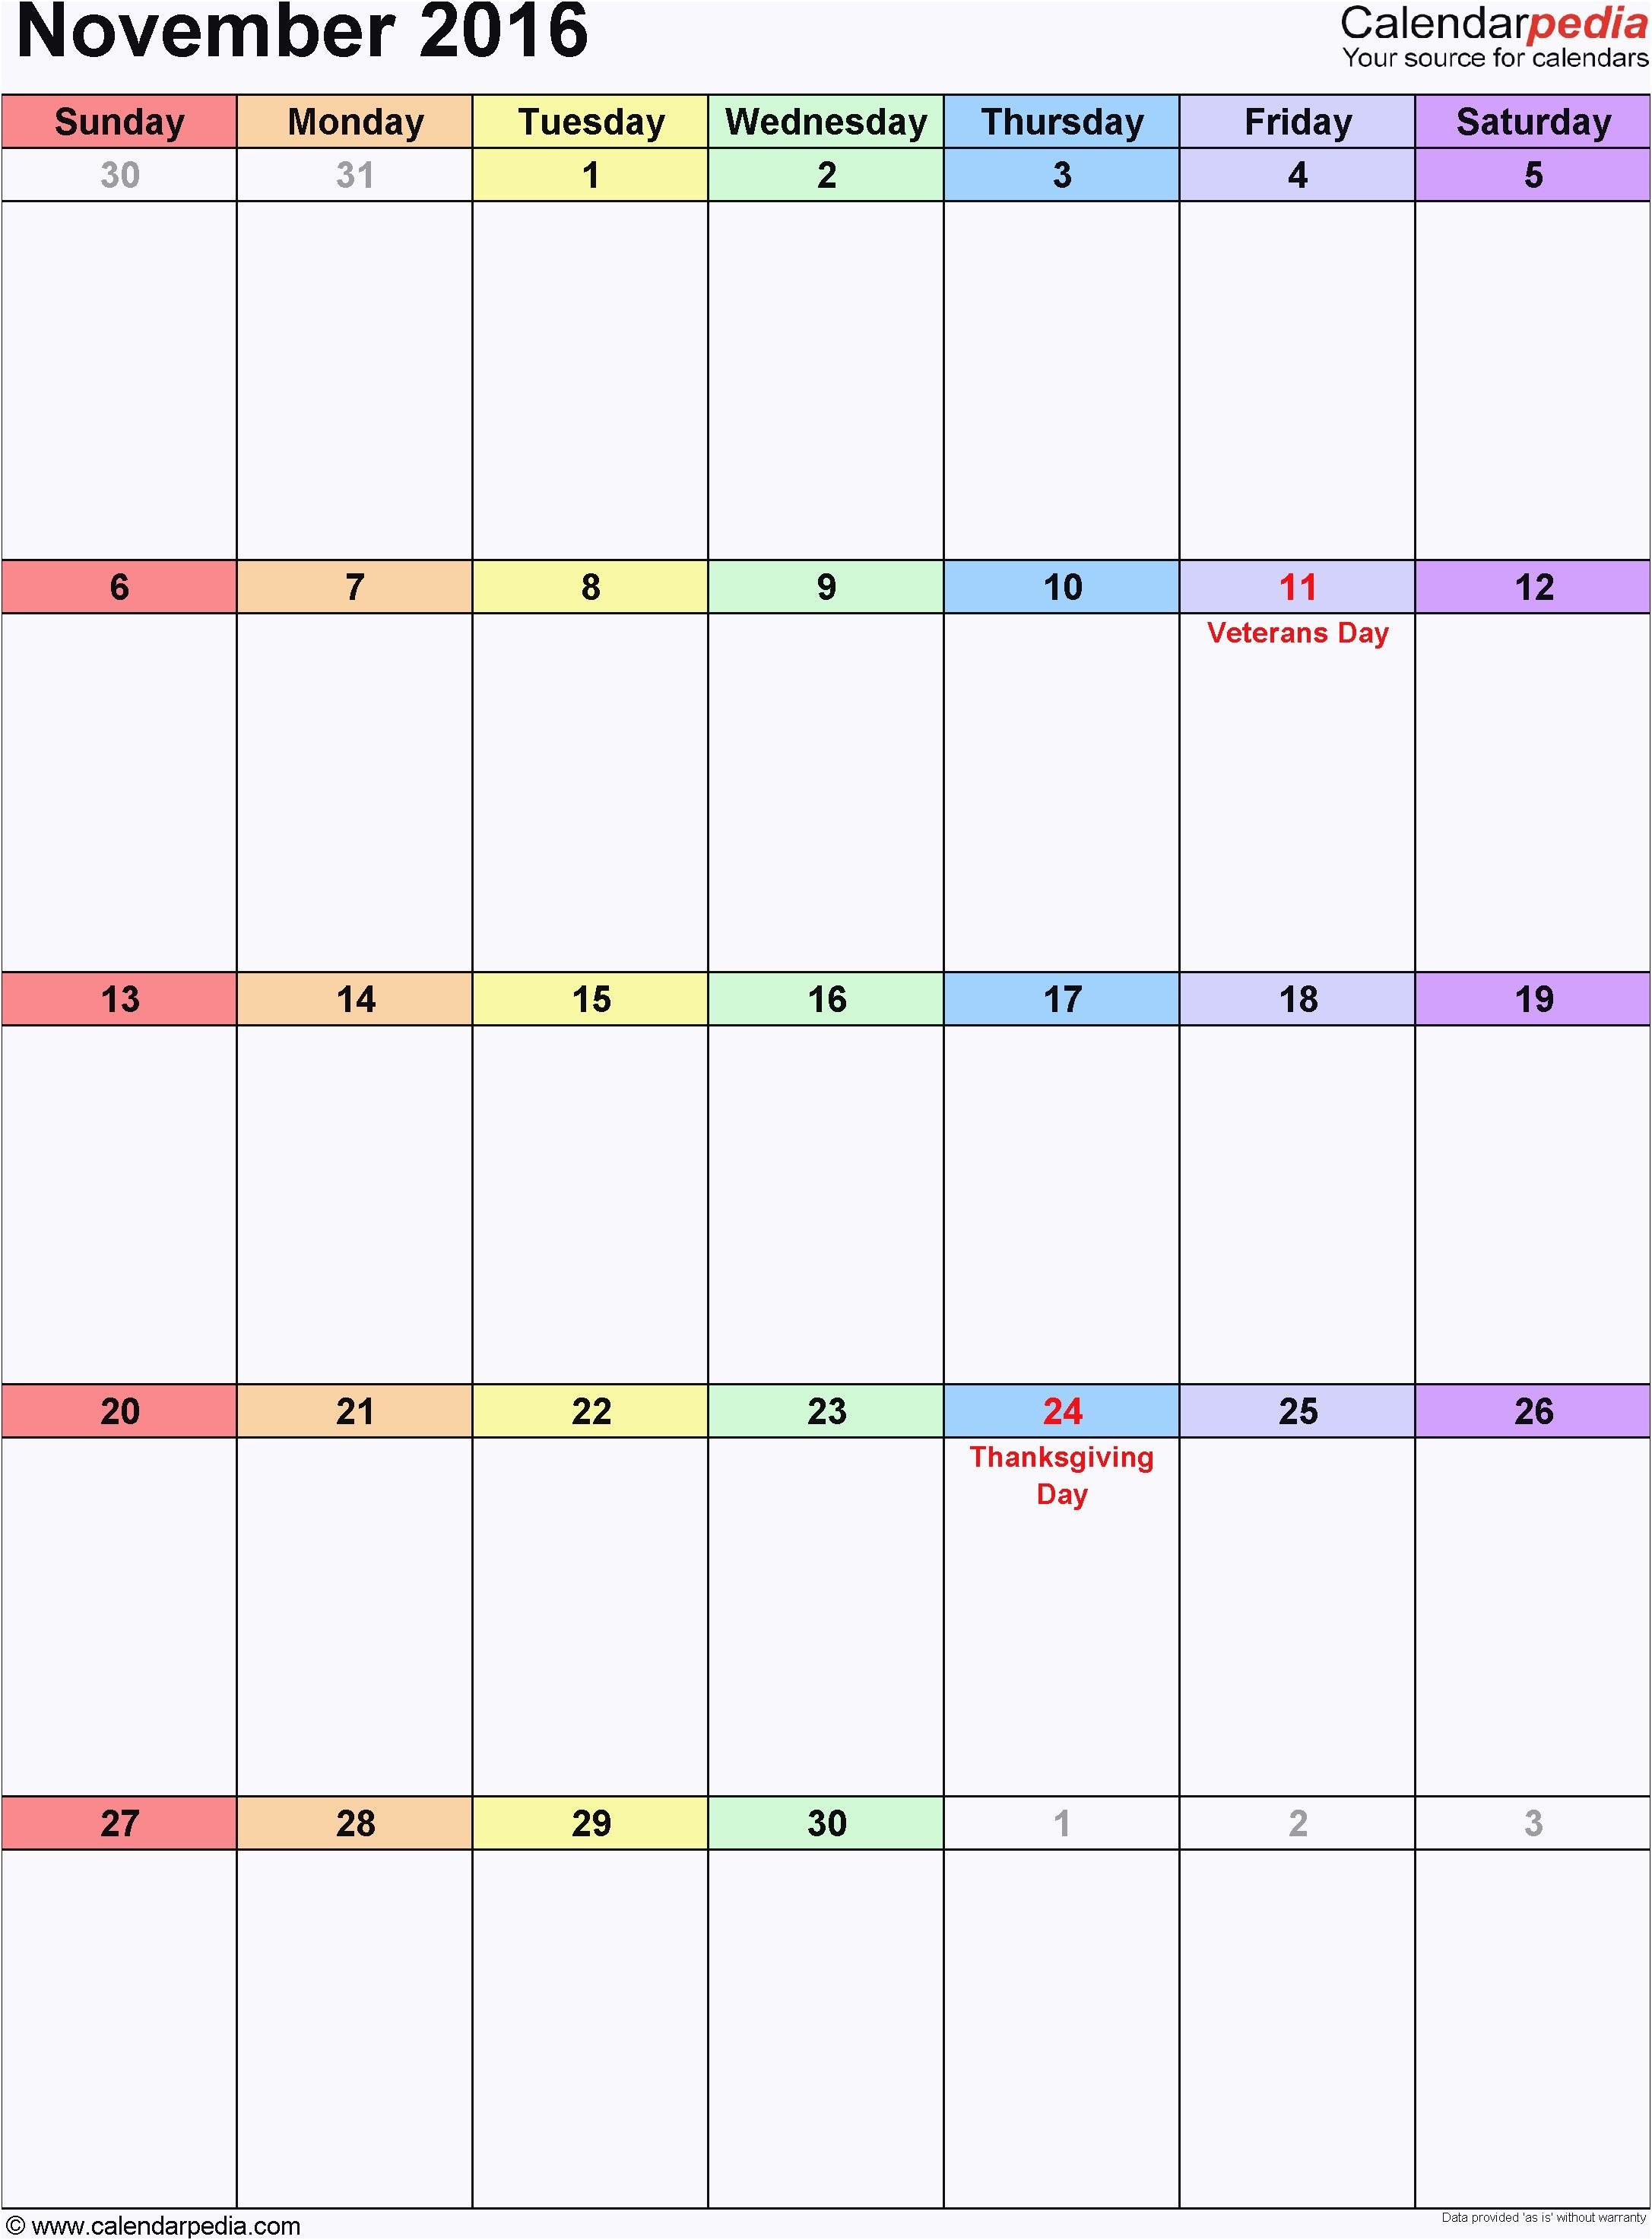 March Calendar Art Más Reciente Genial Kalender 2015 Vorlage Of March Calendar Art Más Actual Templates for Powerpoint Swimlane Template Luxury A E A Calendar